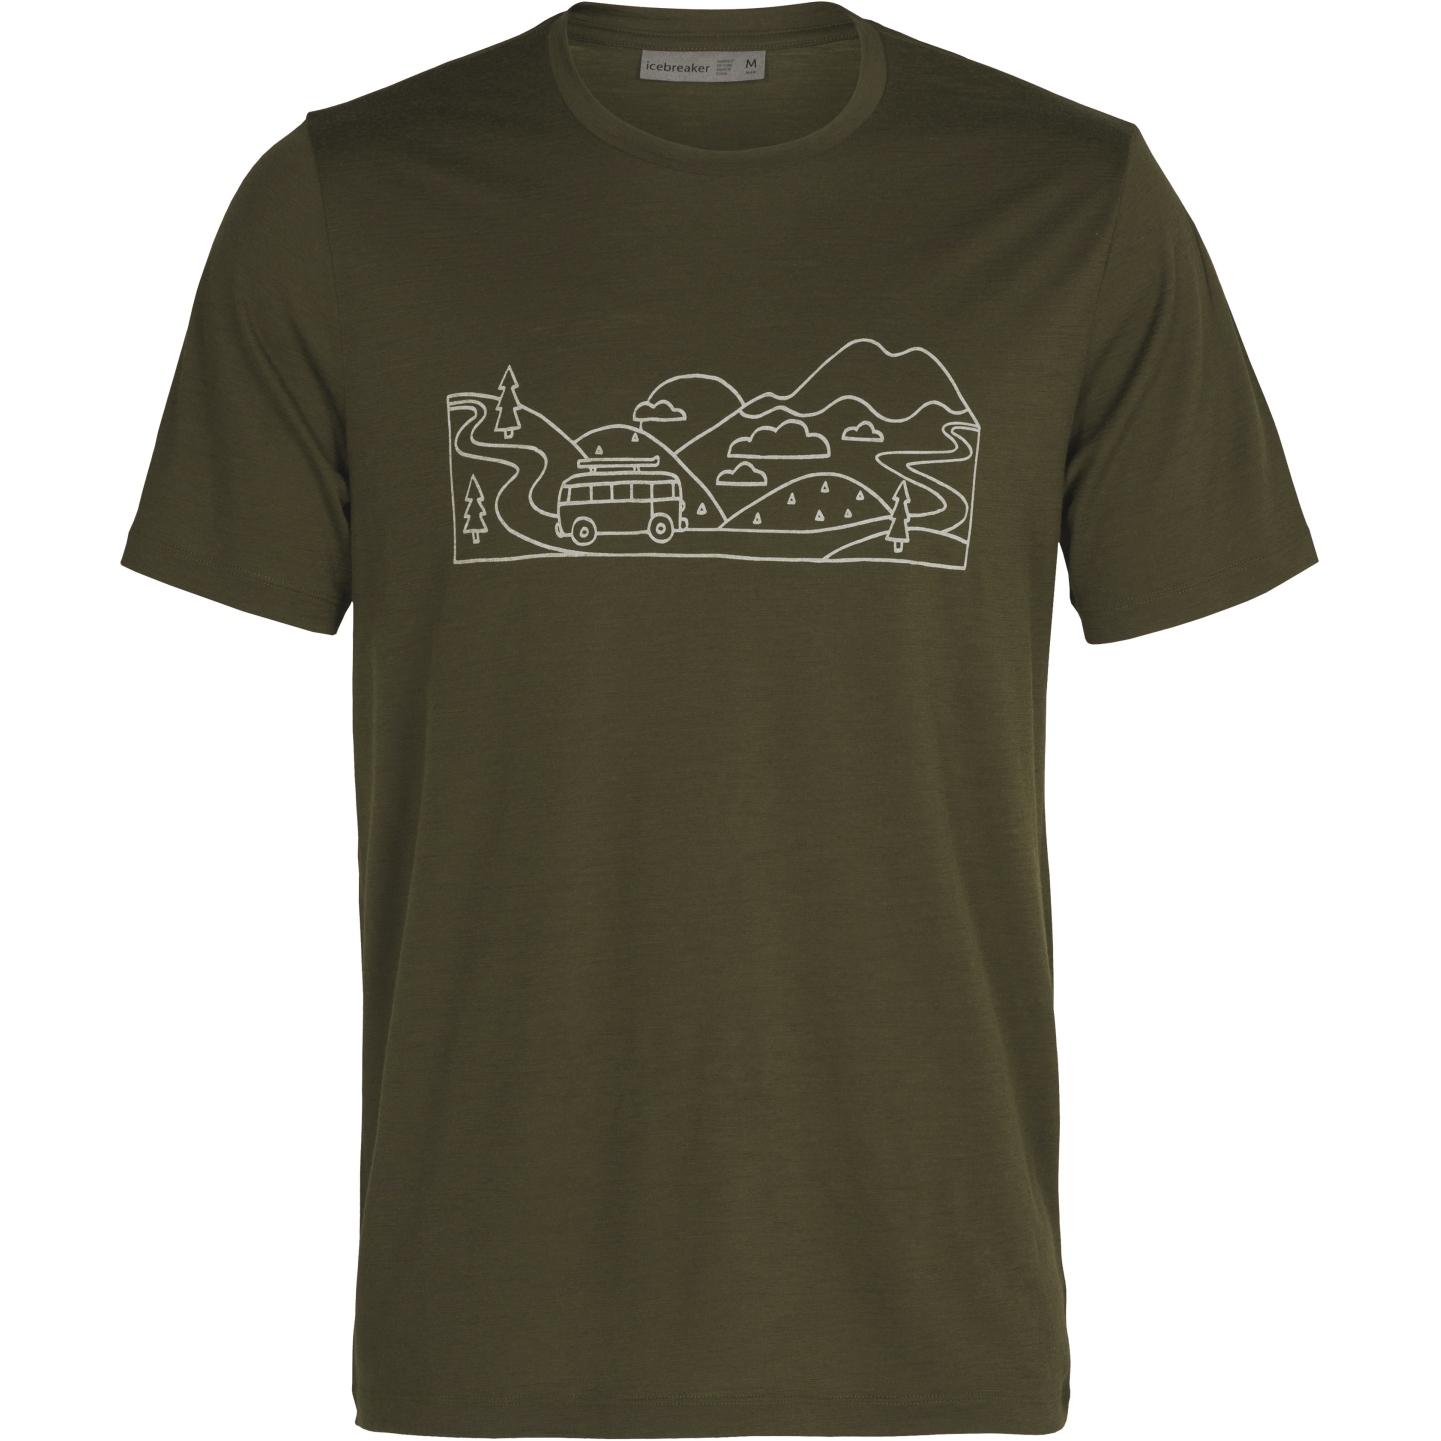 Produktbild von Icebreaker Tech Lite II Combi Ski Trip Herren T-Shirt - Loden